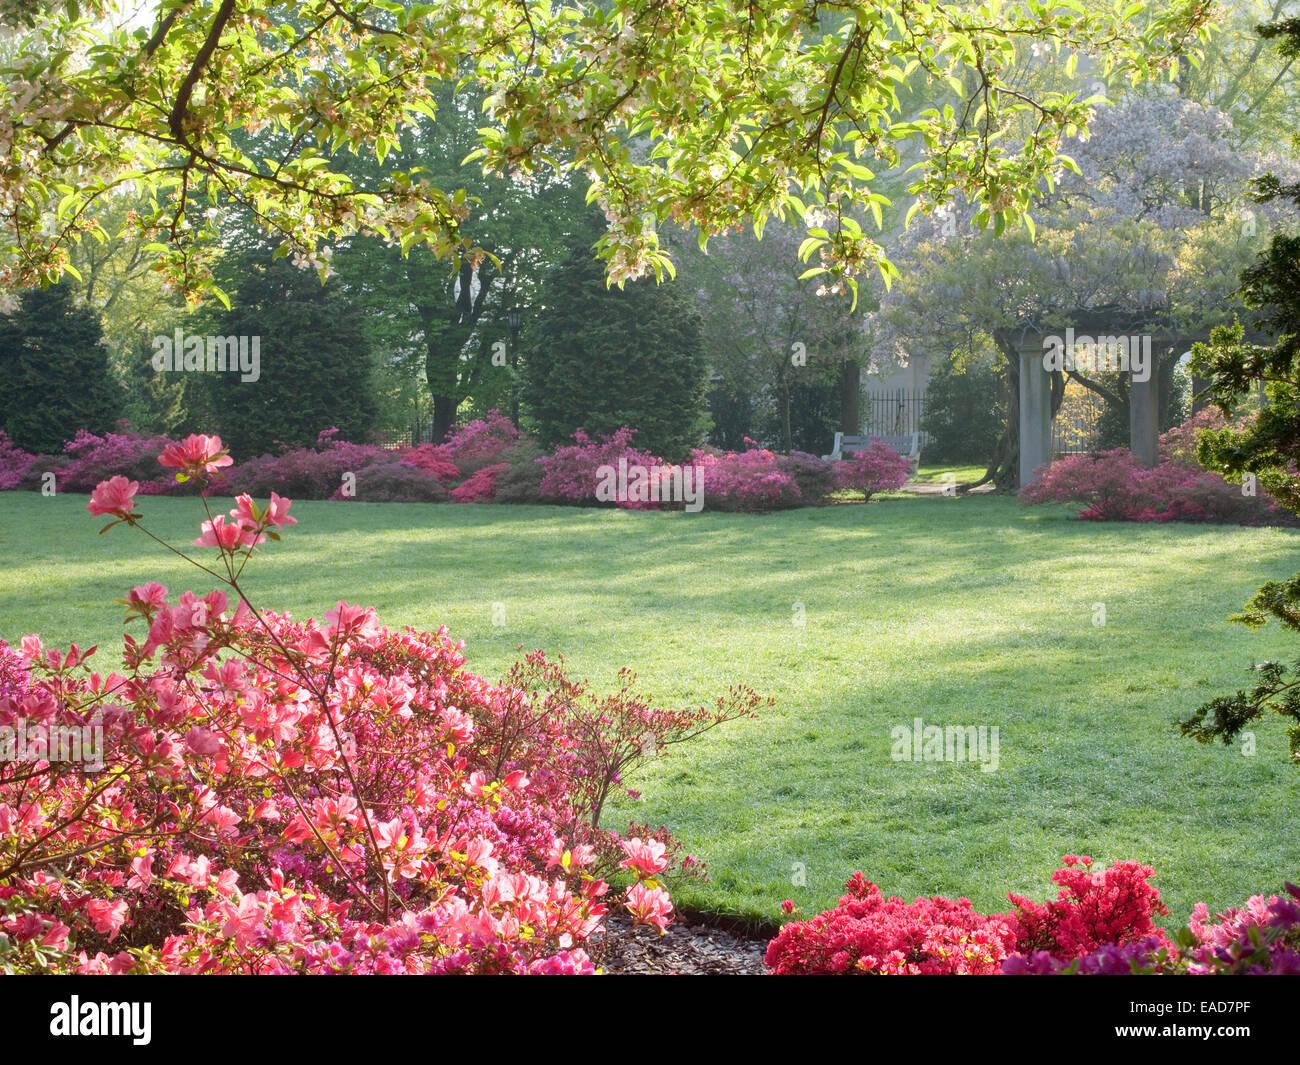 Spring garden with blooming Azaleas - Stock Image